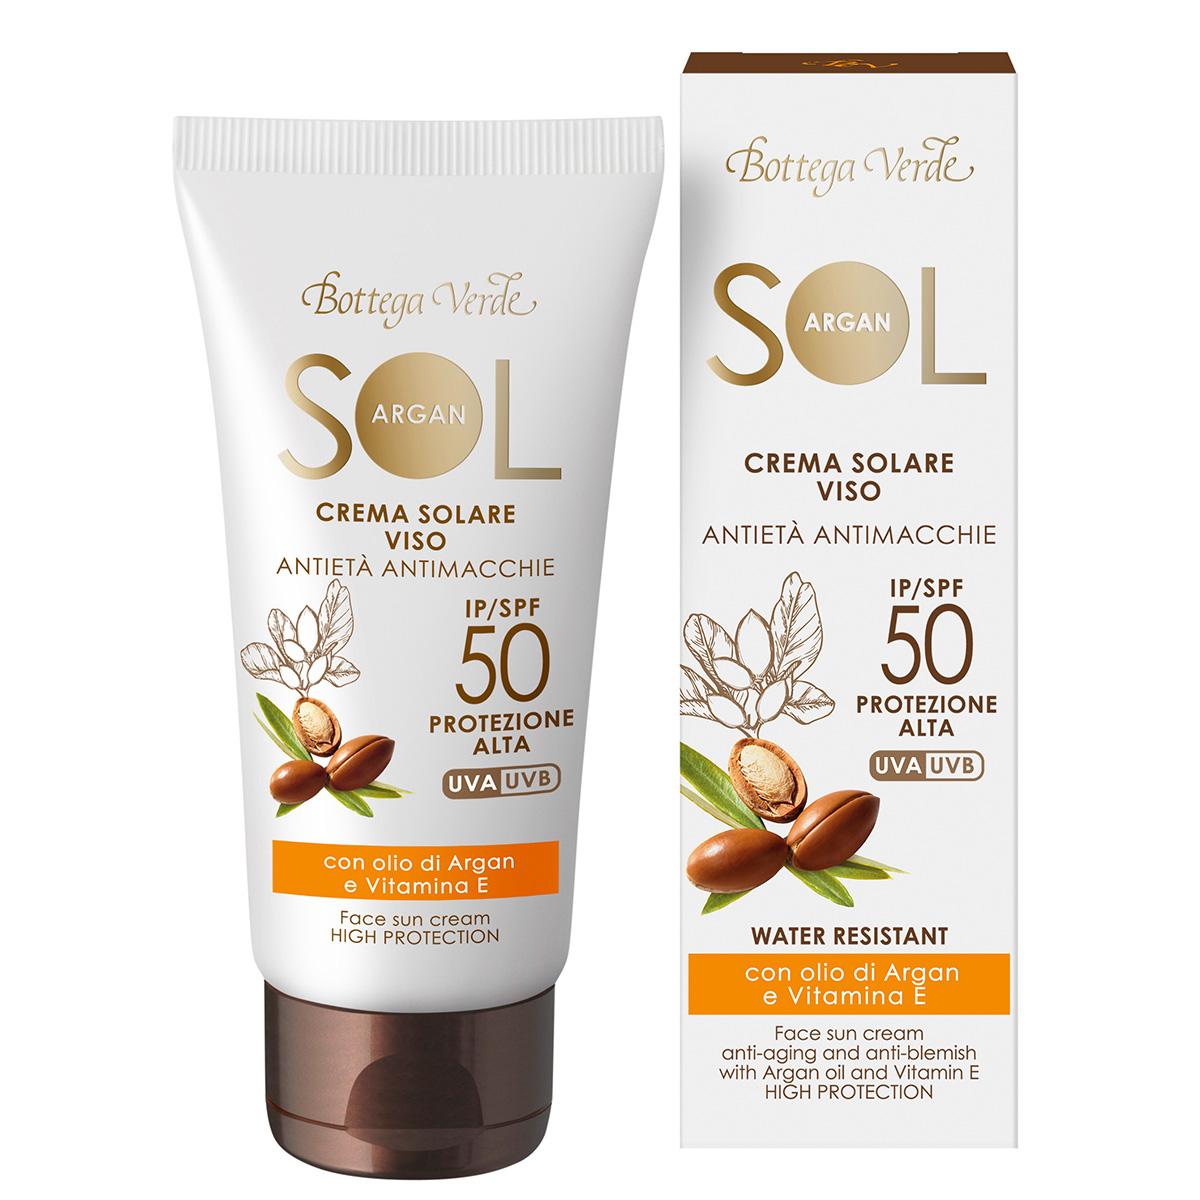 Protectie Solara - Crema de fata pentru plaja cu efect anti-imbatranire, anti-pata - cu ulei de argan si vitamina E - rezistenta la apa - SPF50